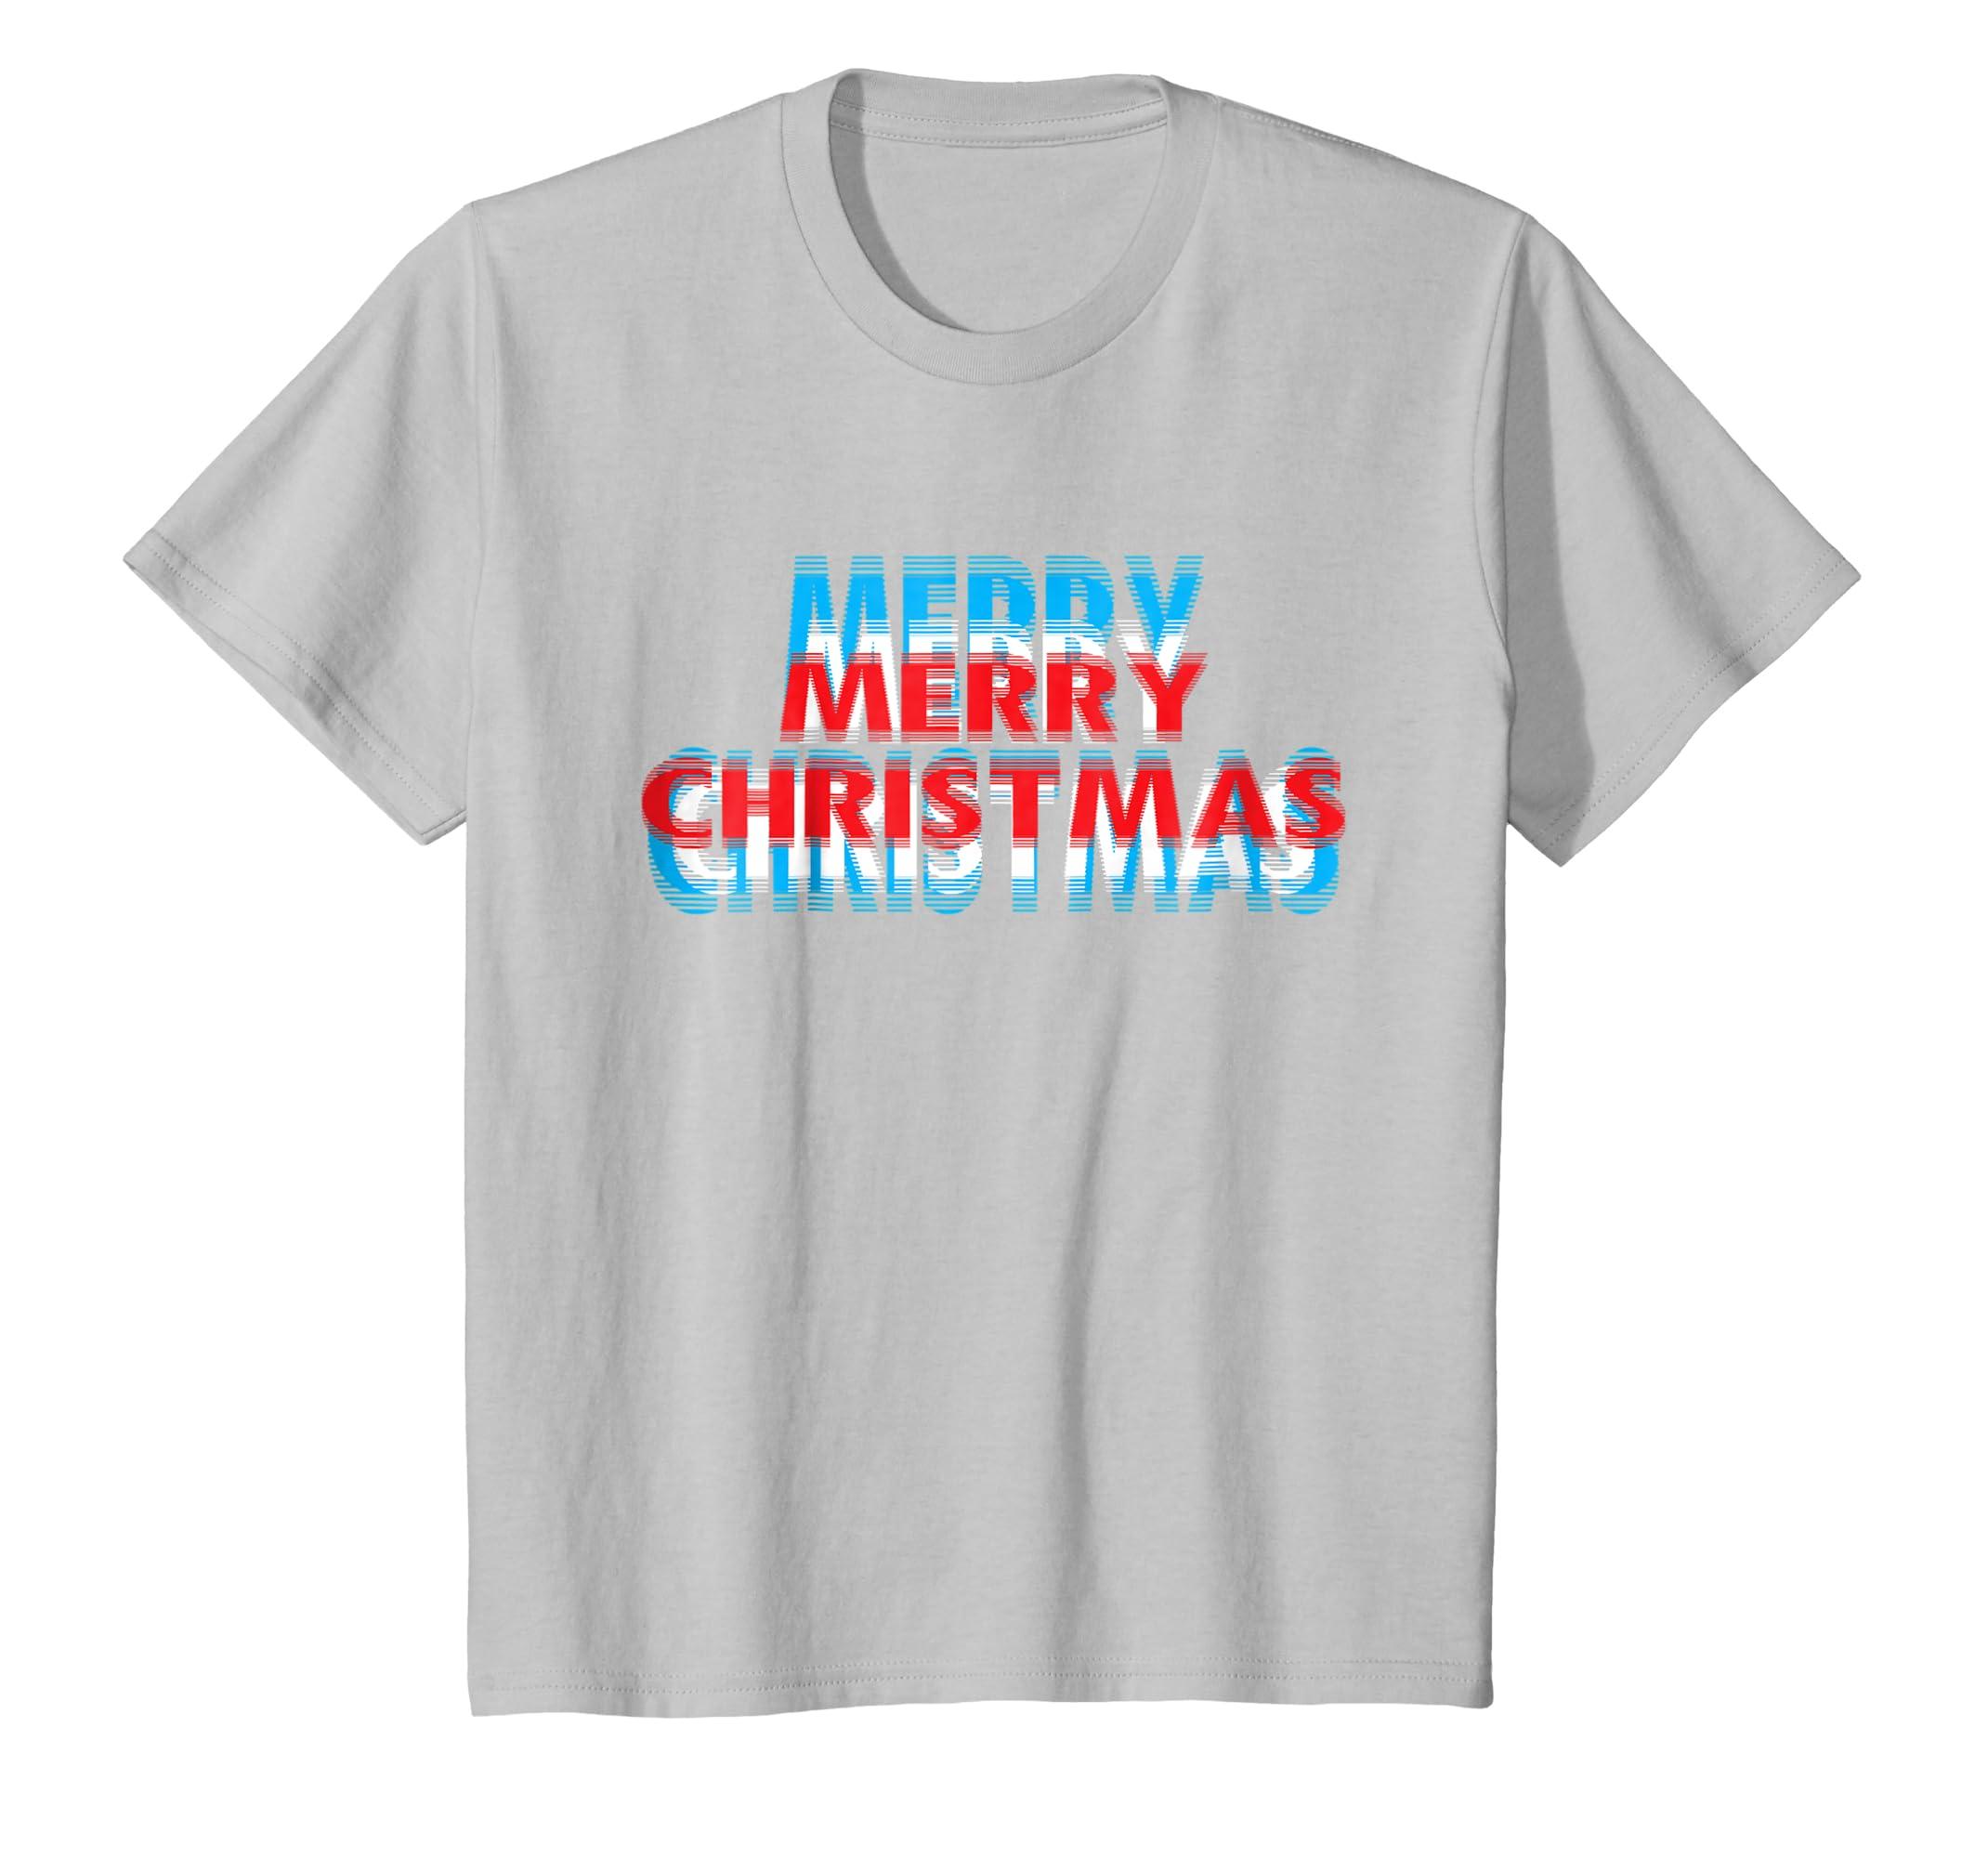 Merry Christmas Blurred Effect Design T Shirt-Teechatpro